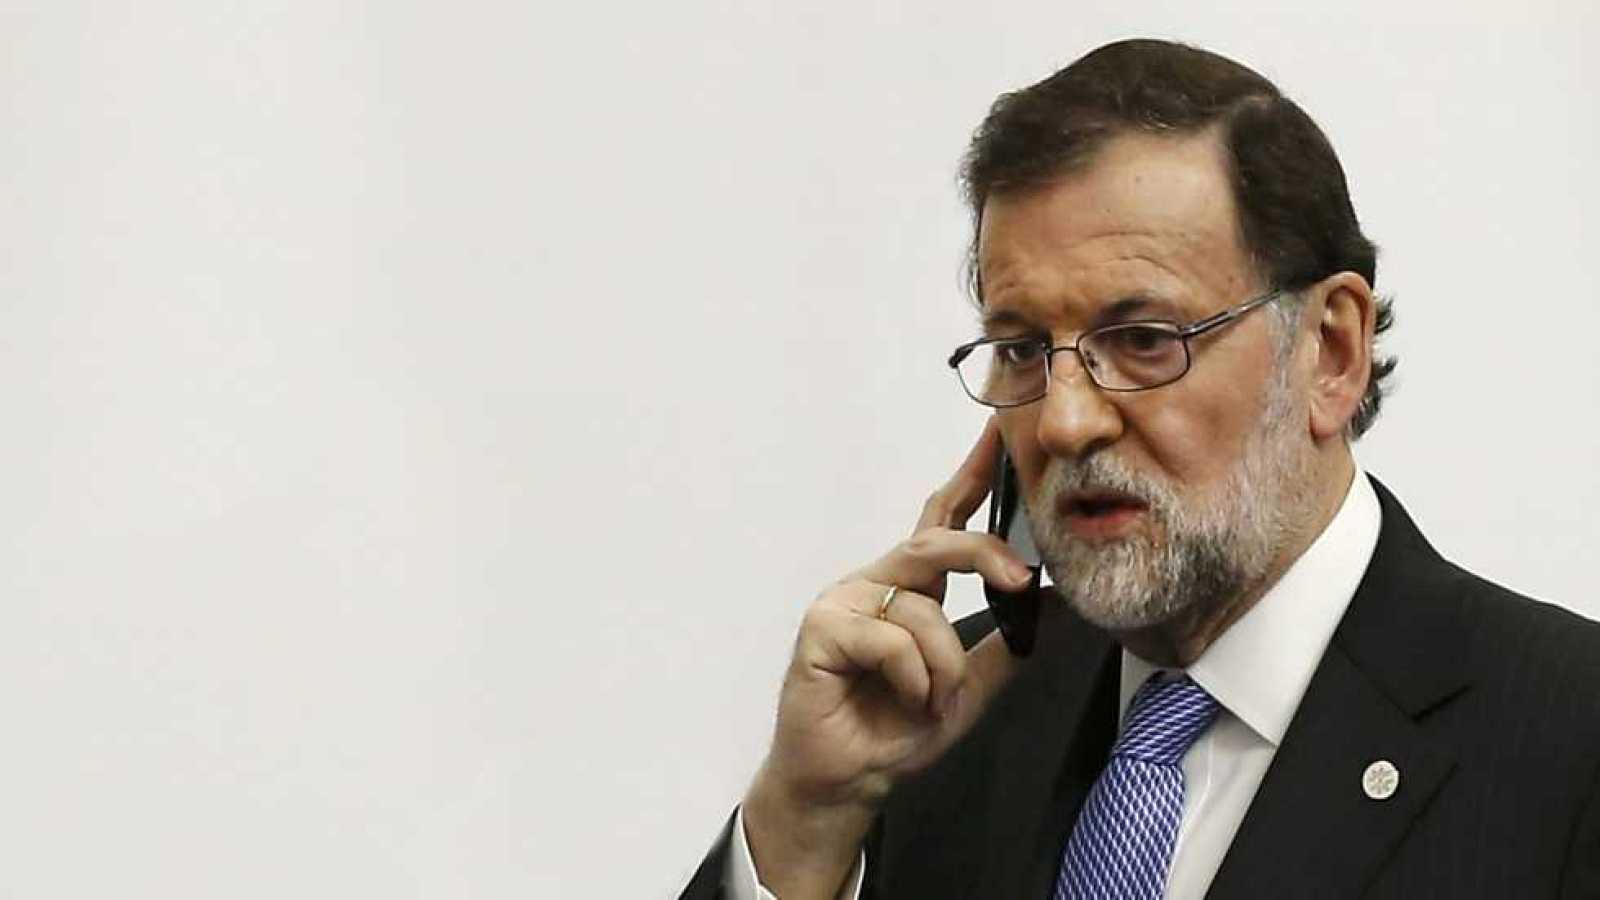 Telediario - 21 horas - 07/02/17 - RTVE.es